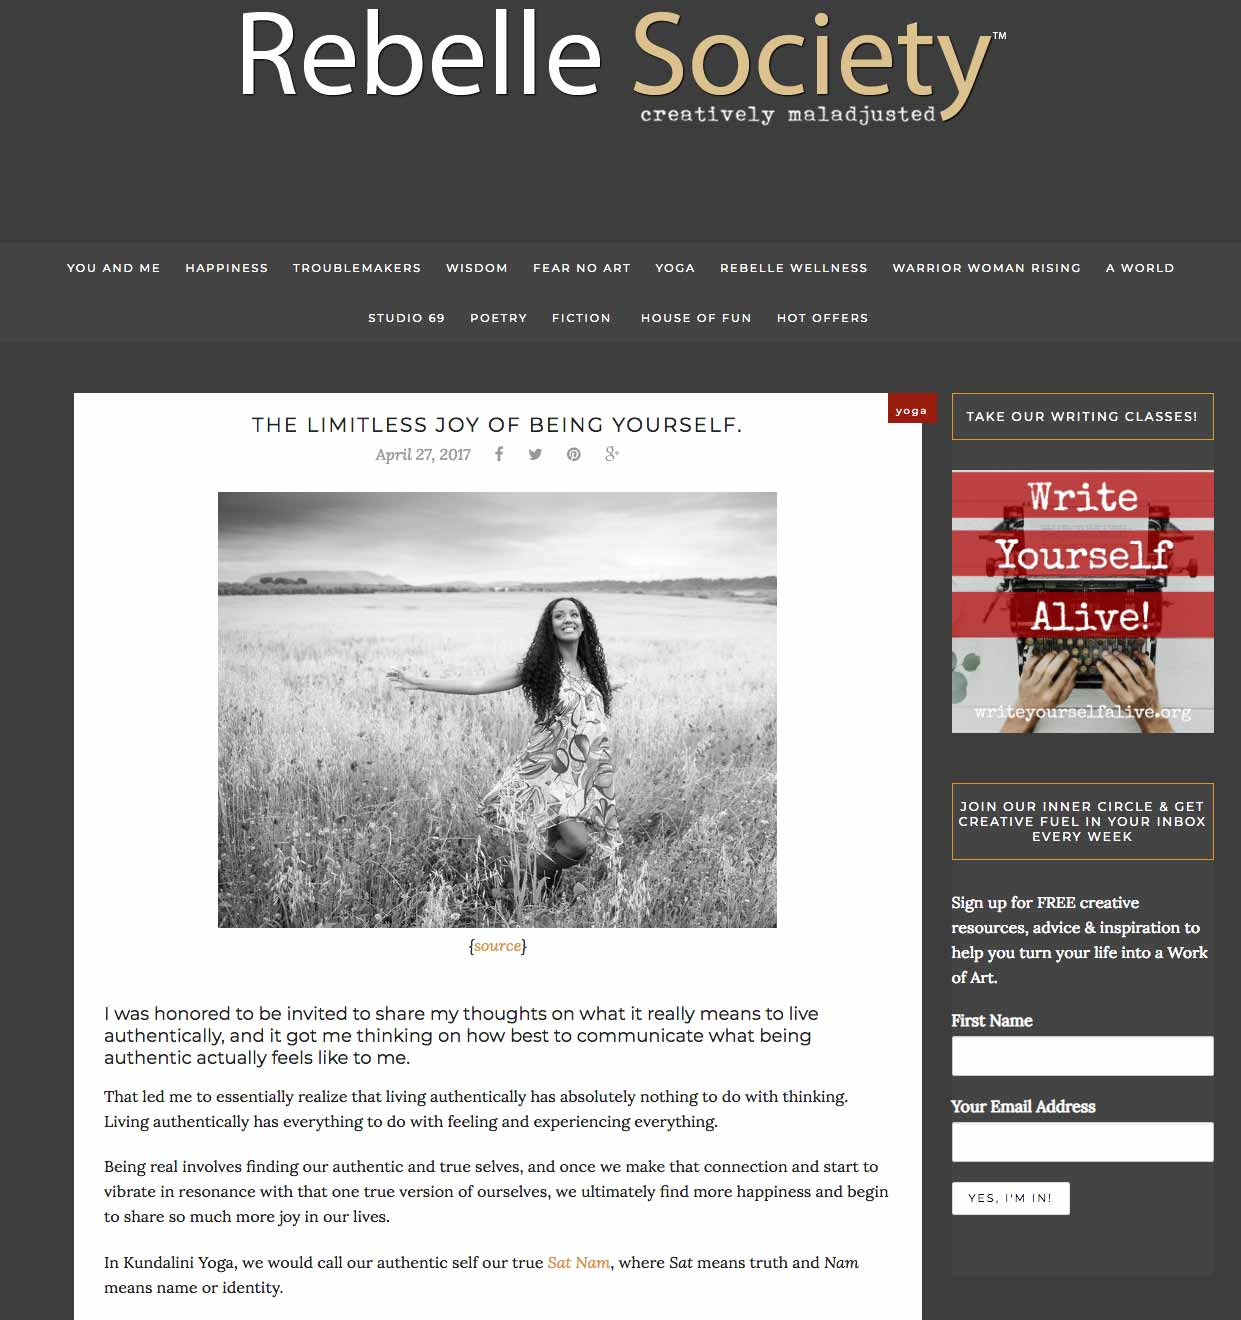 rebellesociety2017_1.jpg